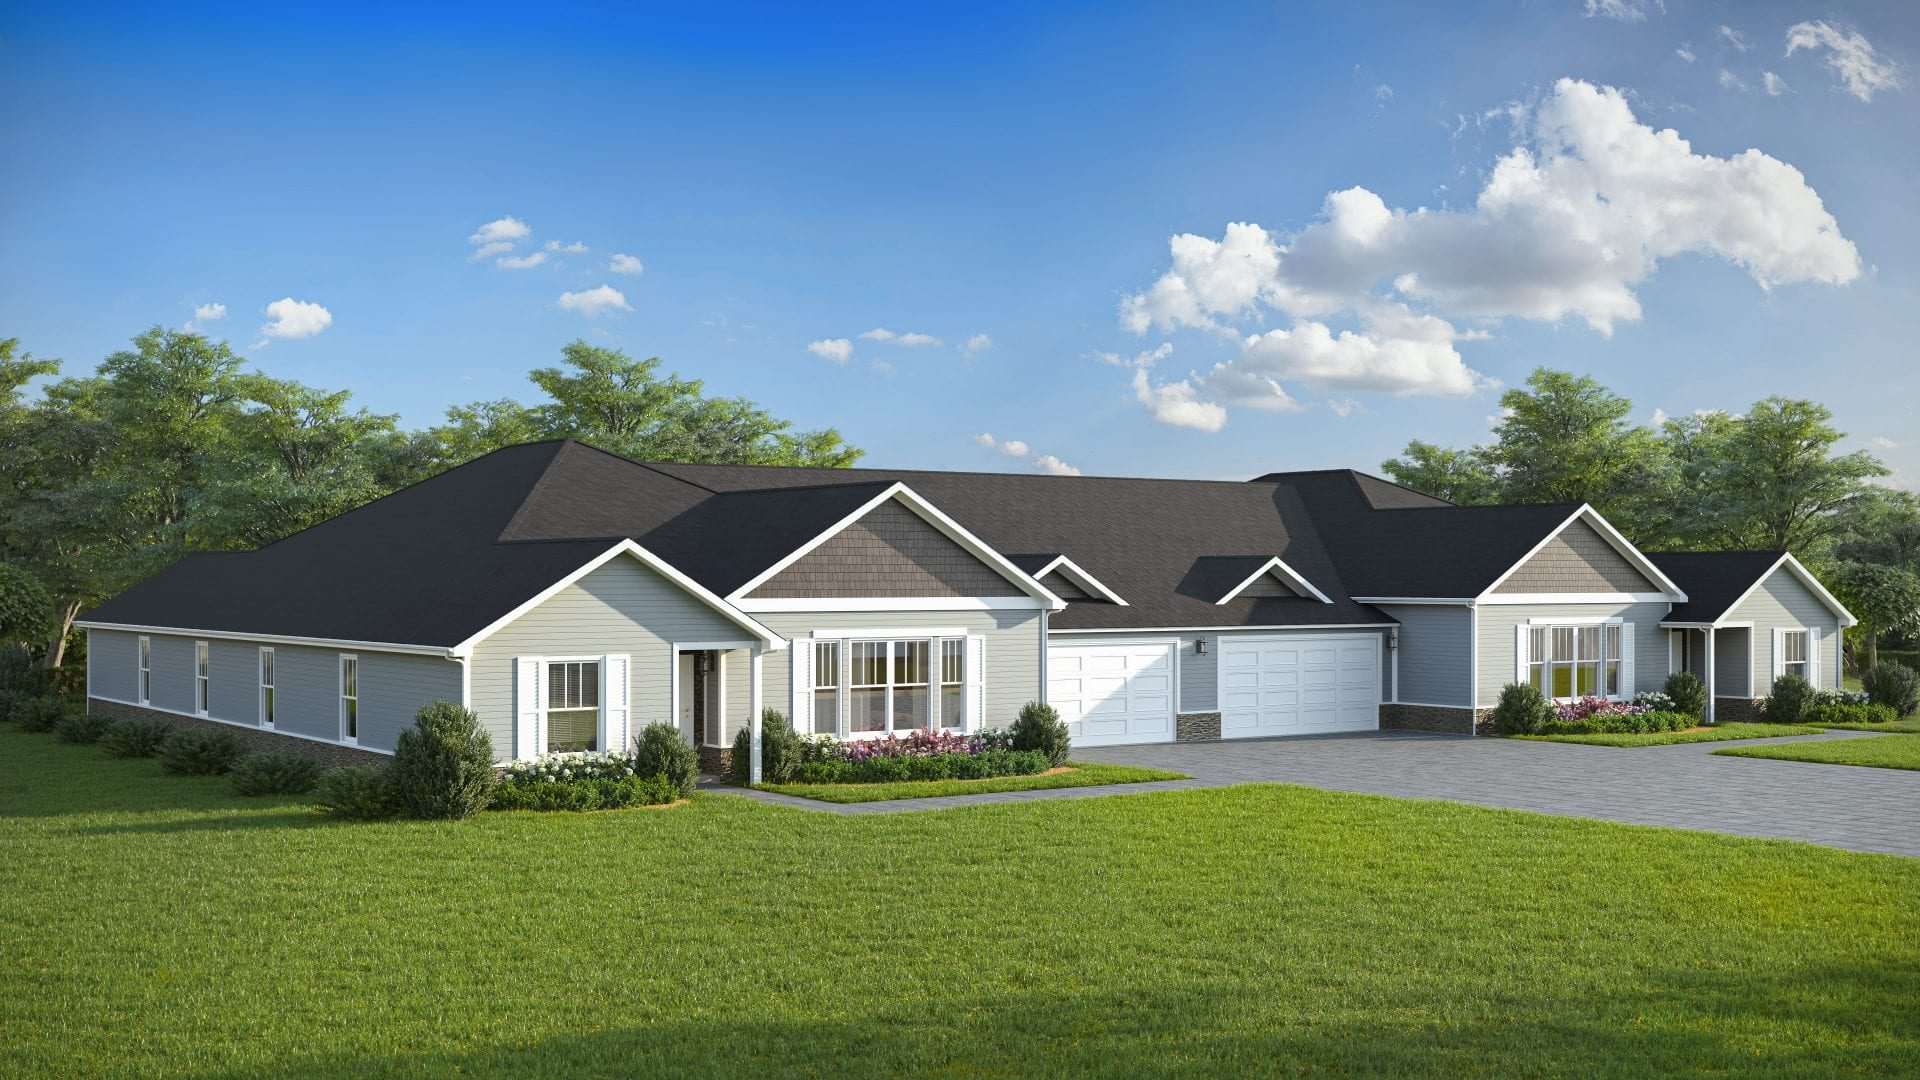 woodridge lake - Premier Homes